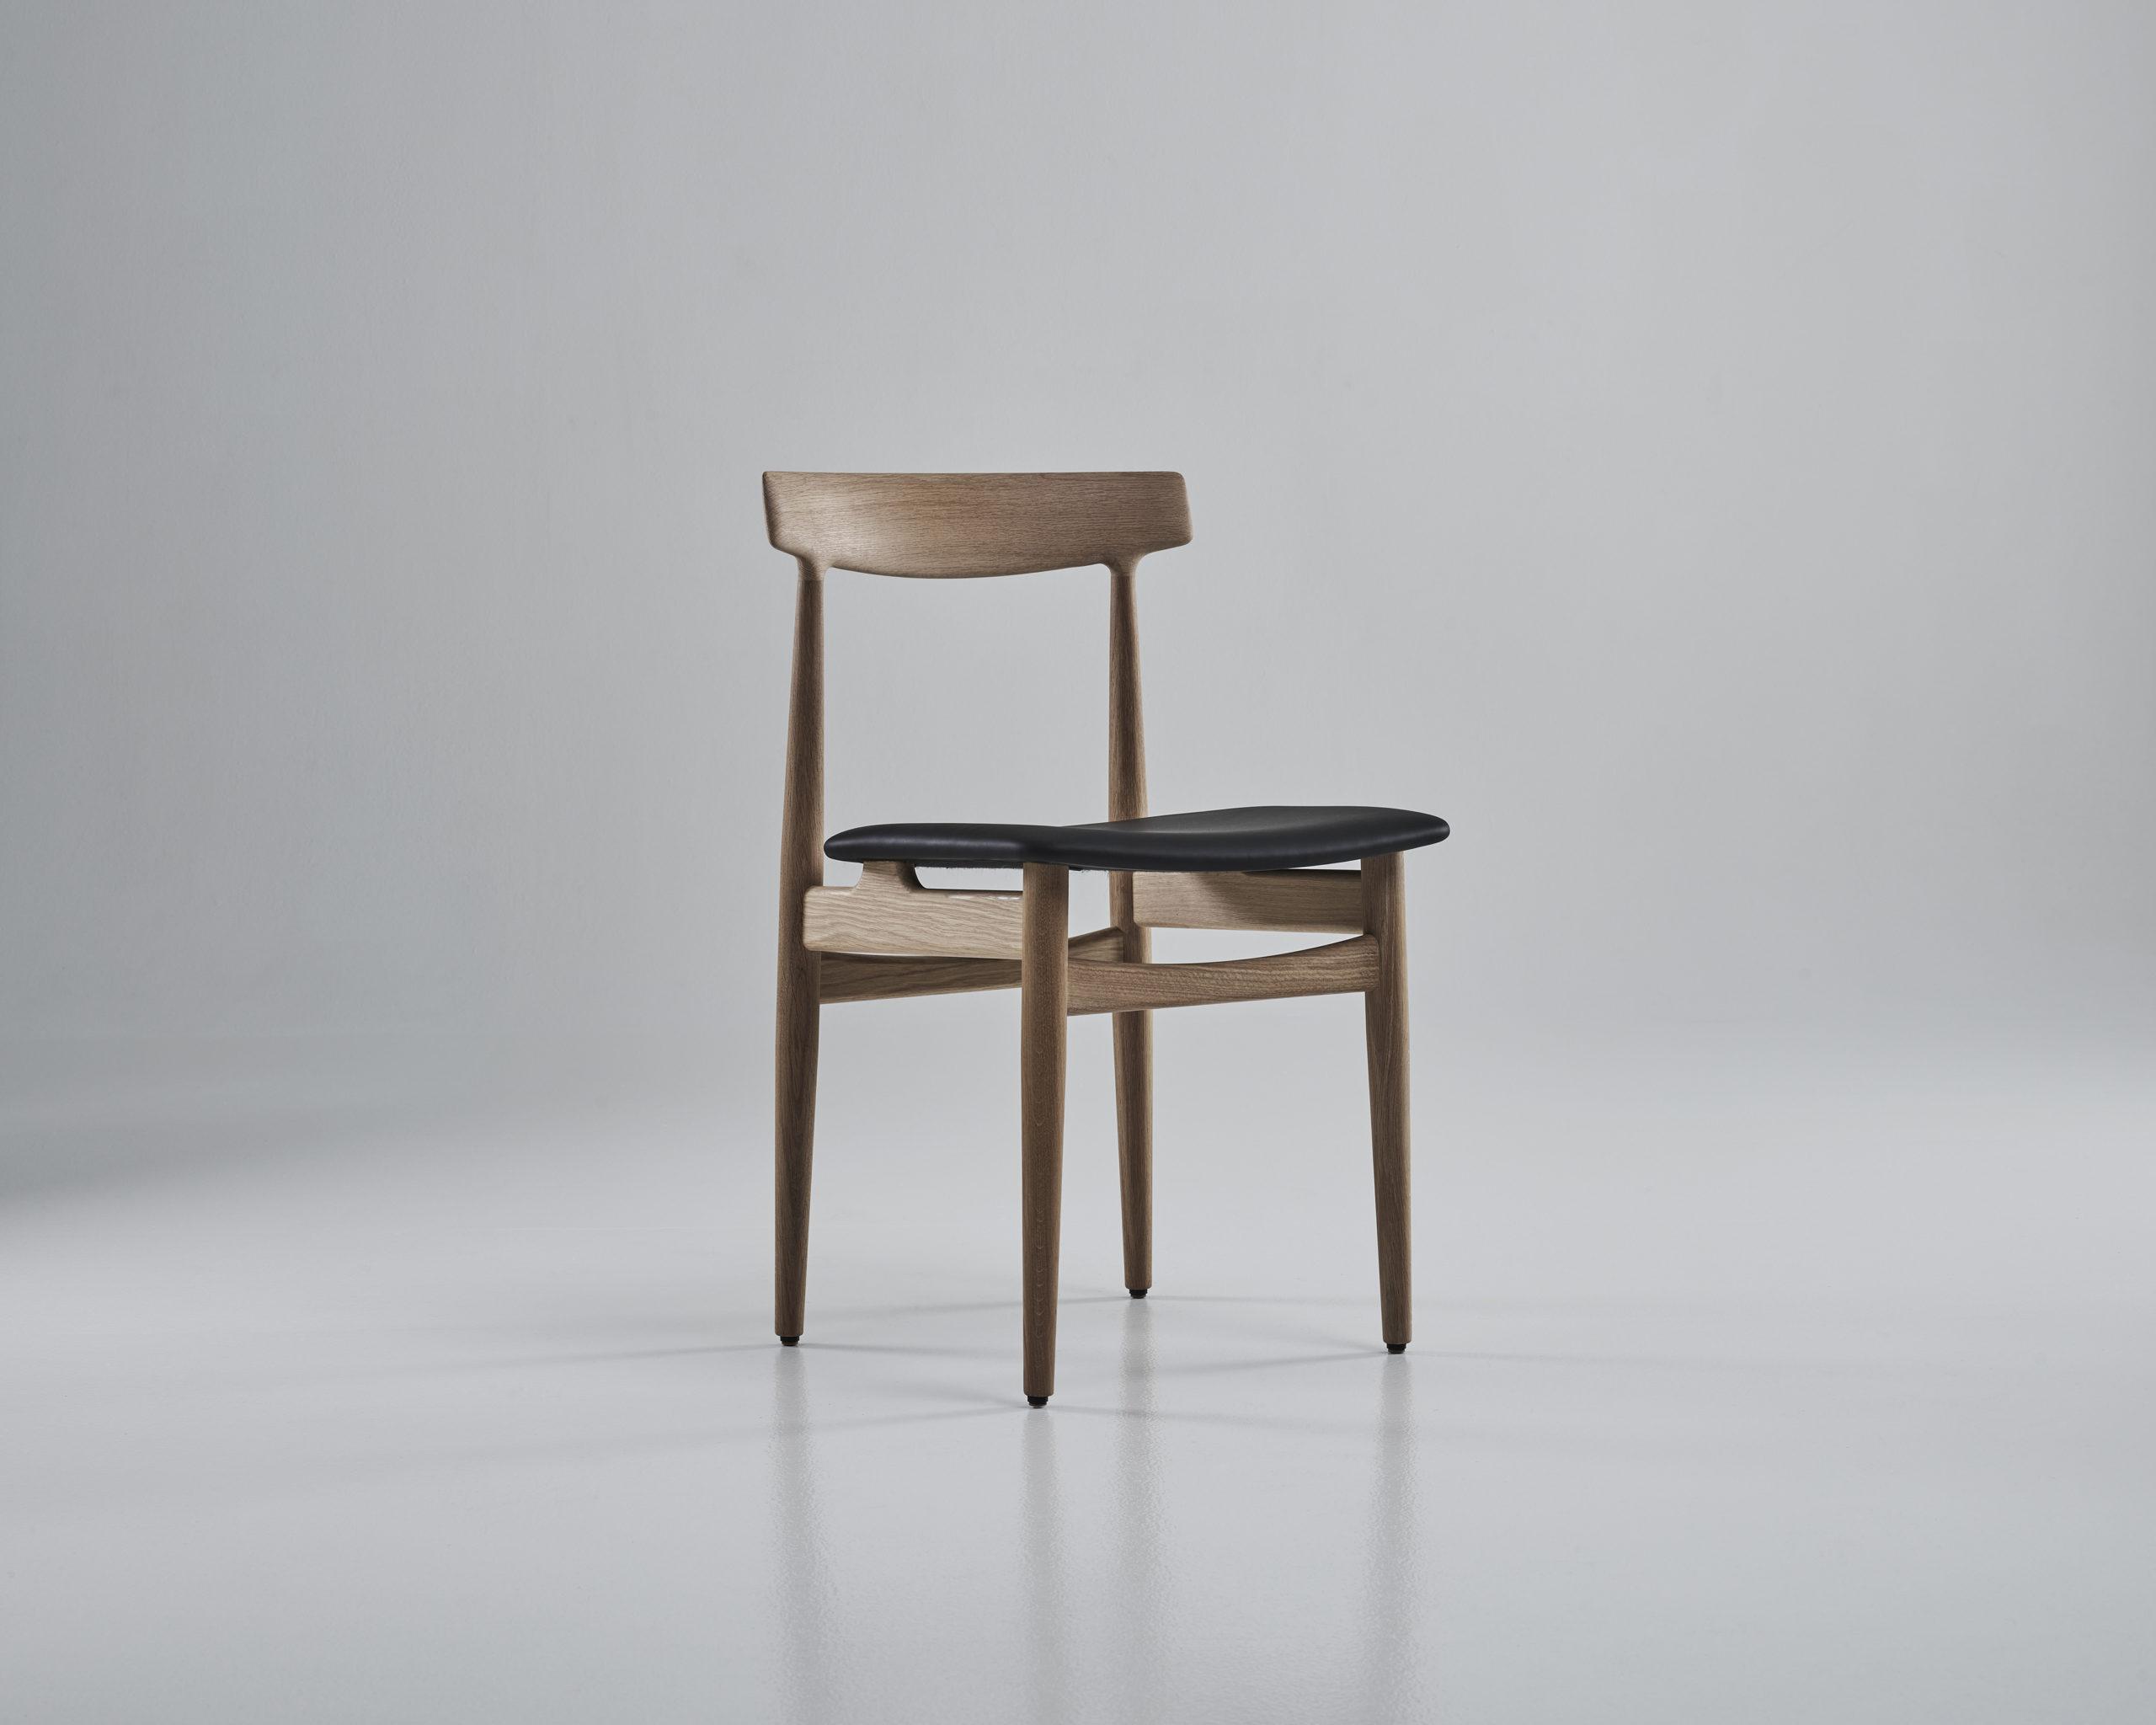 Stylecraft Eikund Hertug Dining Chair Mid Century Design Photo Tom Haga Yellowtrace 01